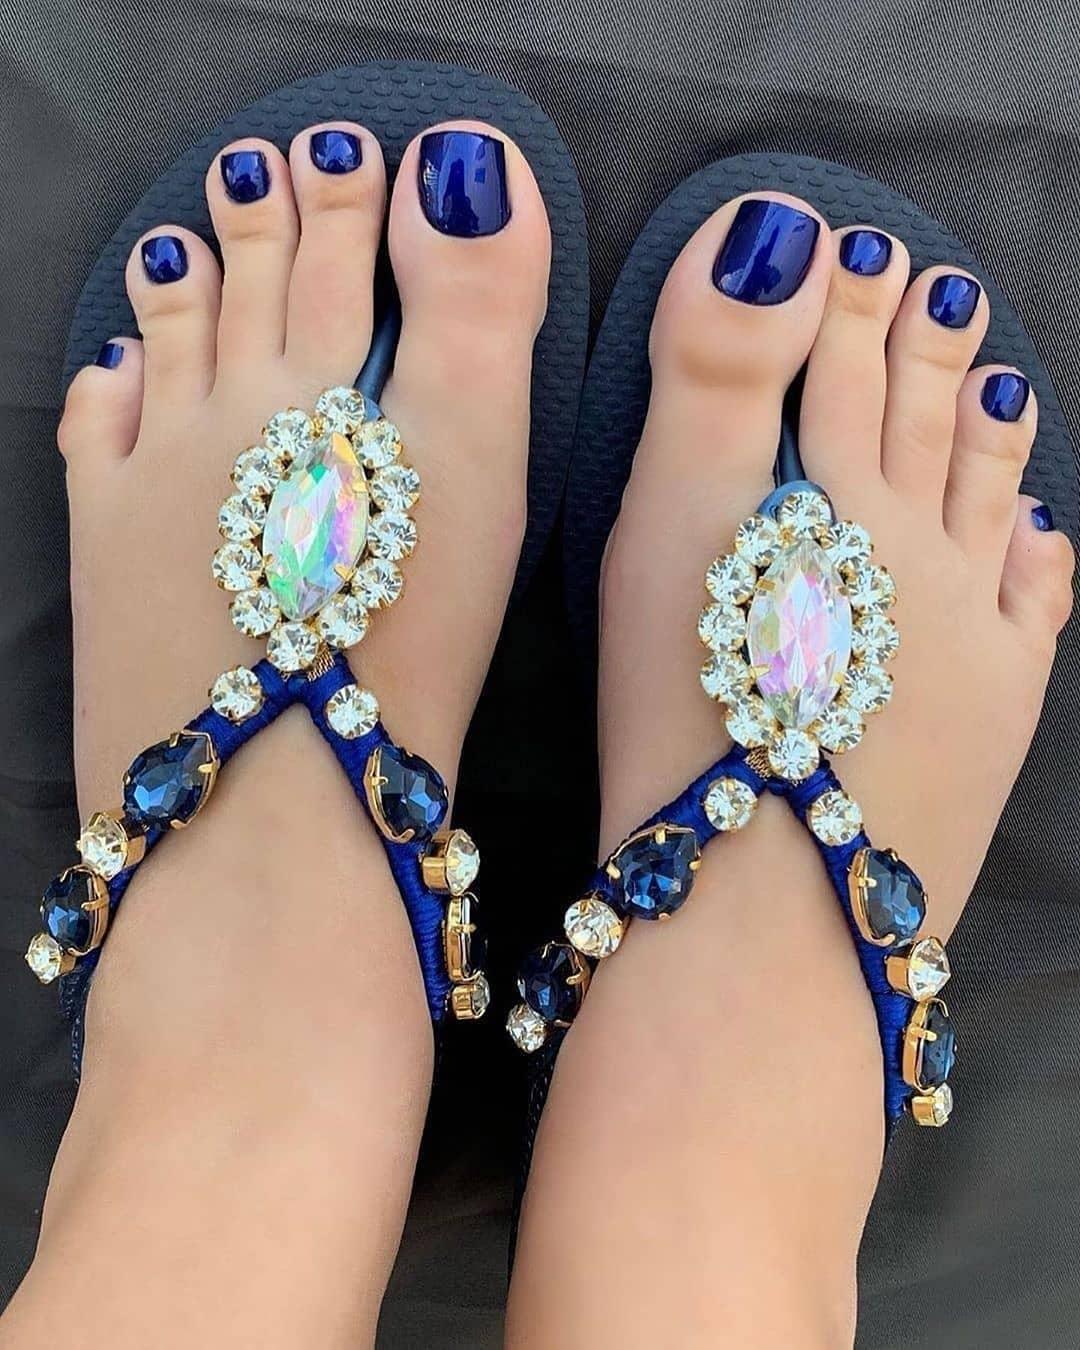 Dark Blue Beach Wear Thongs with Crystals.